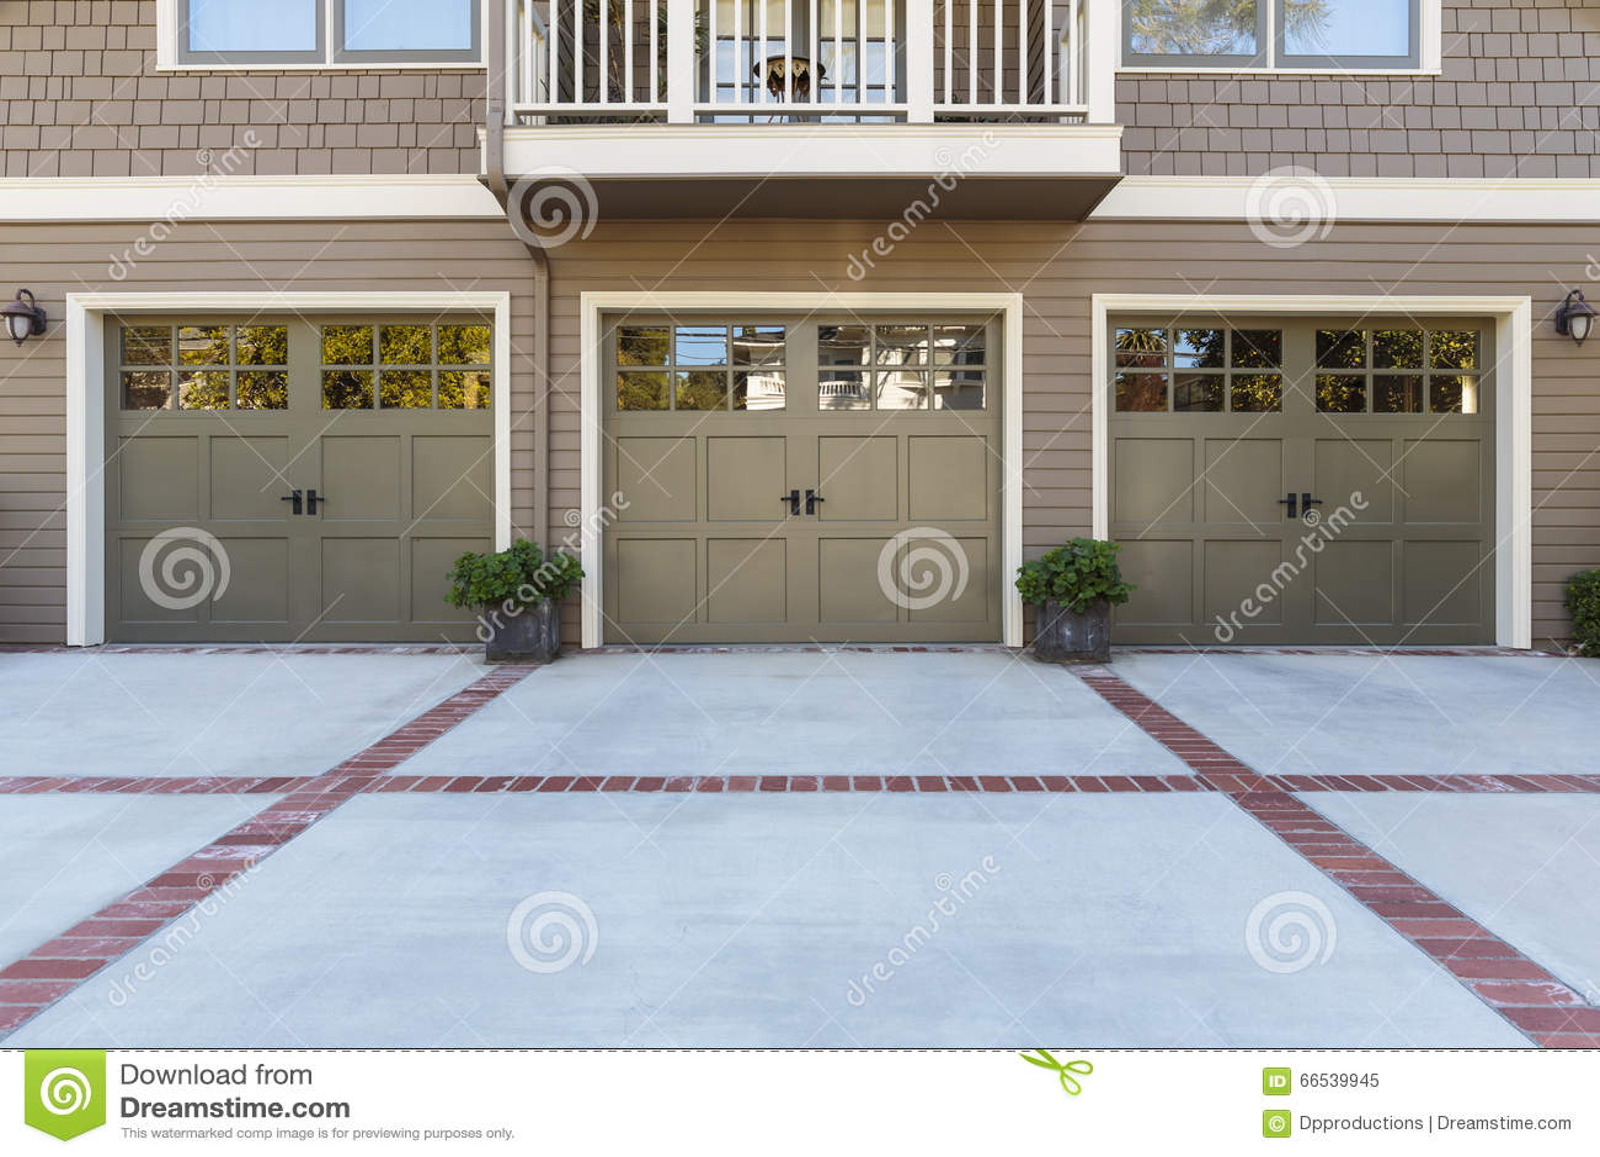 Three Garage Door With Windows Stock Photo Image 66539945